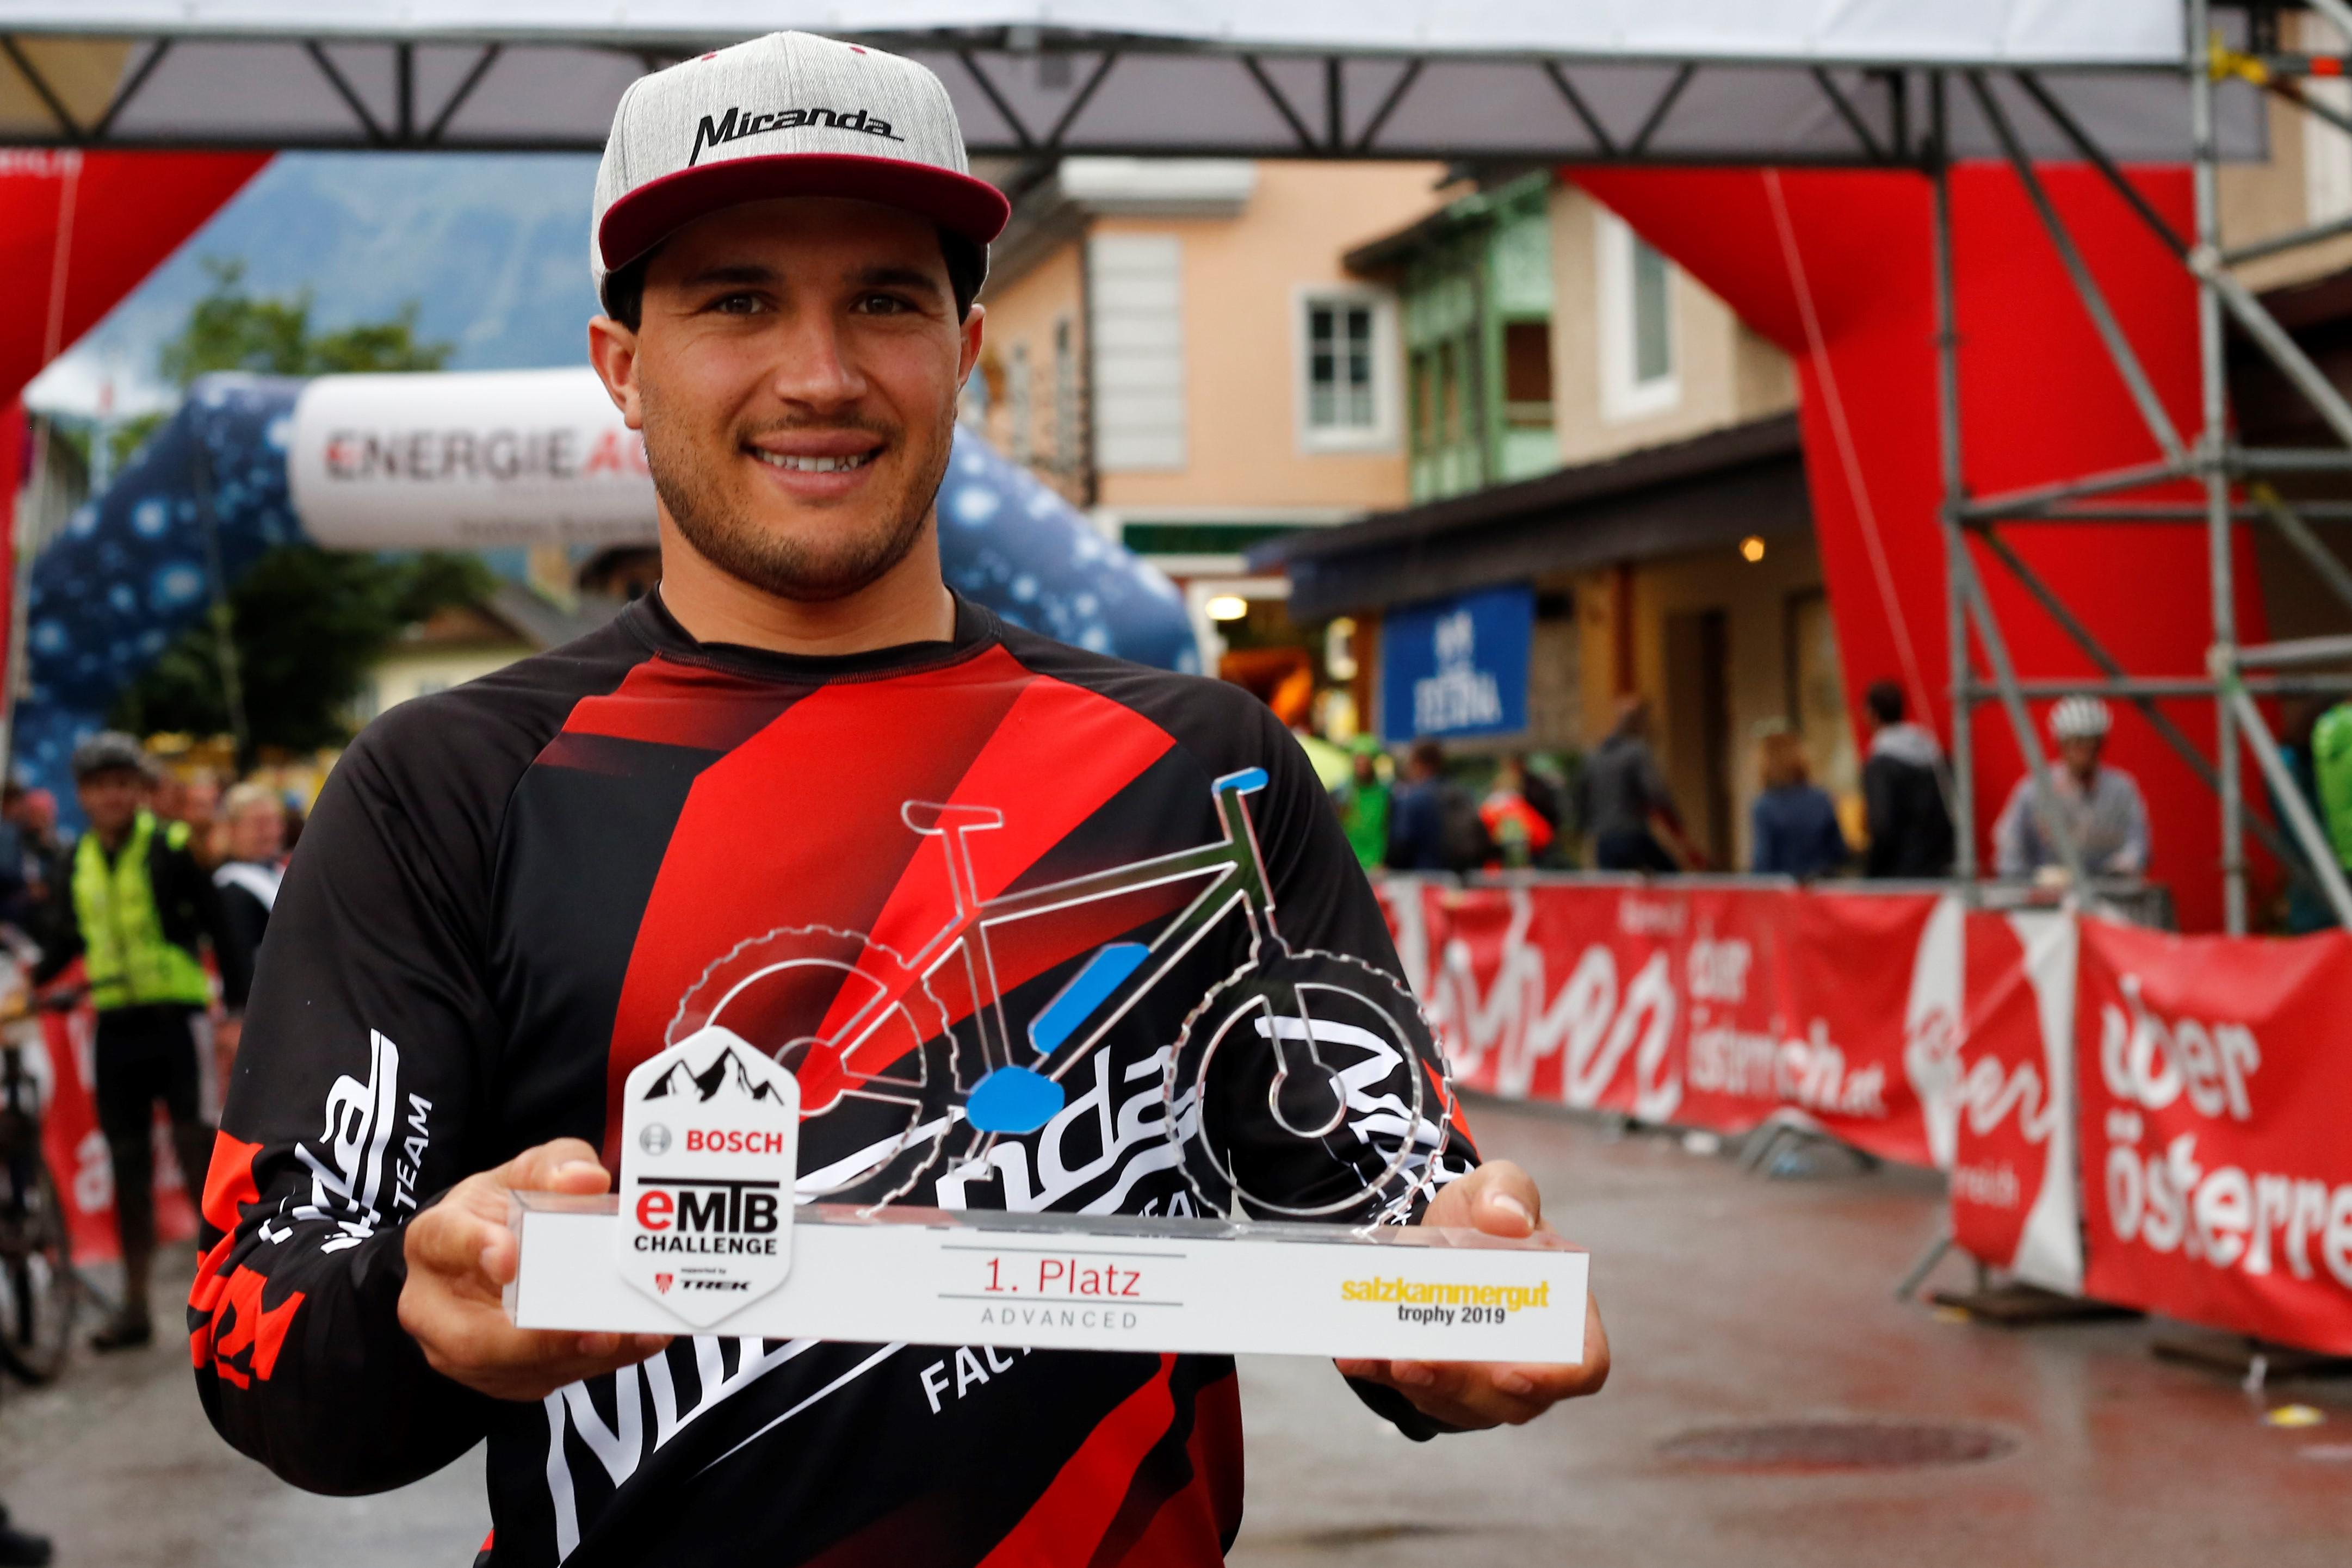 Emanuel Pombo vence na Áustria